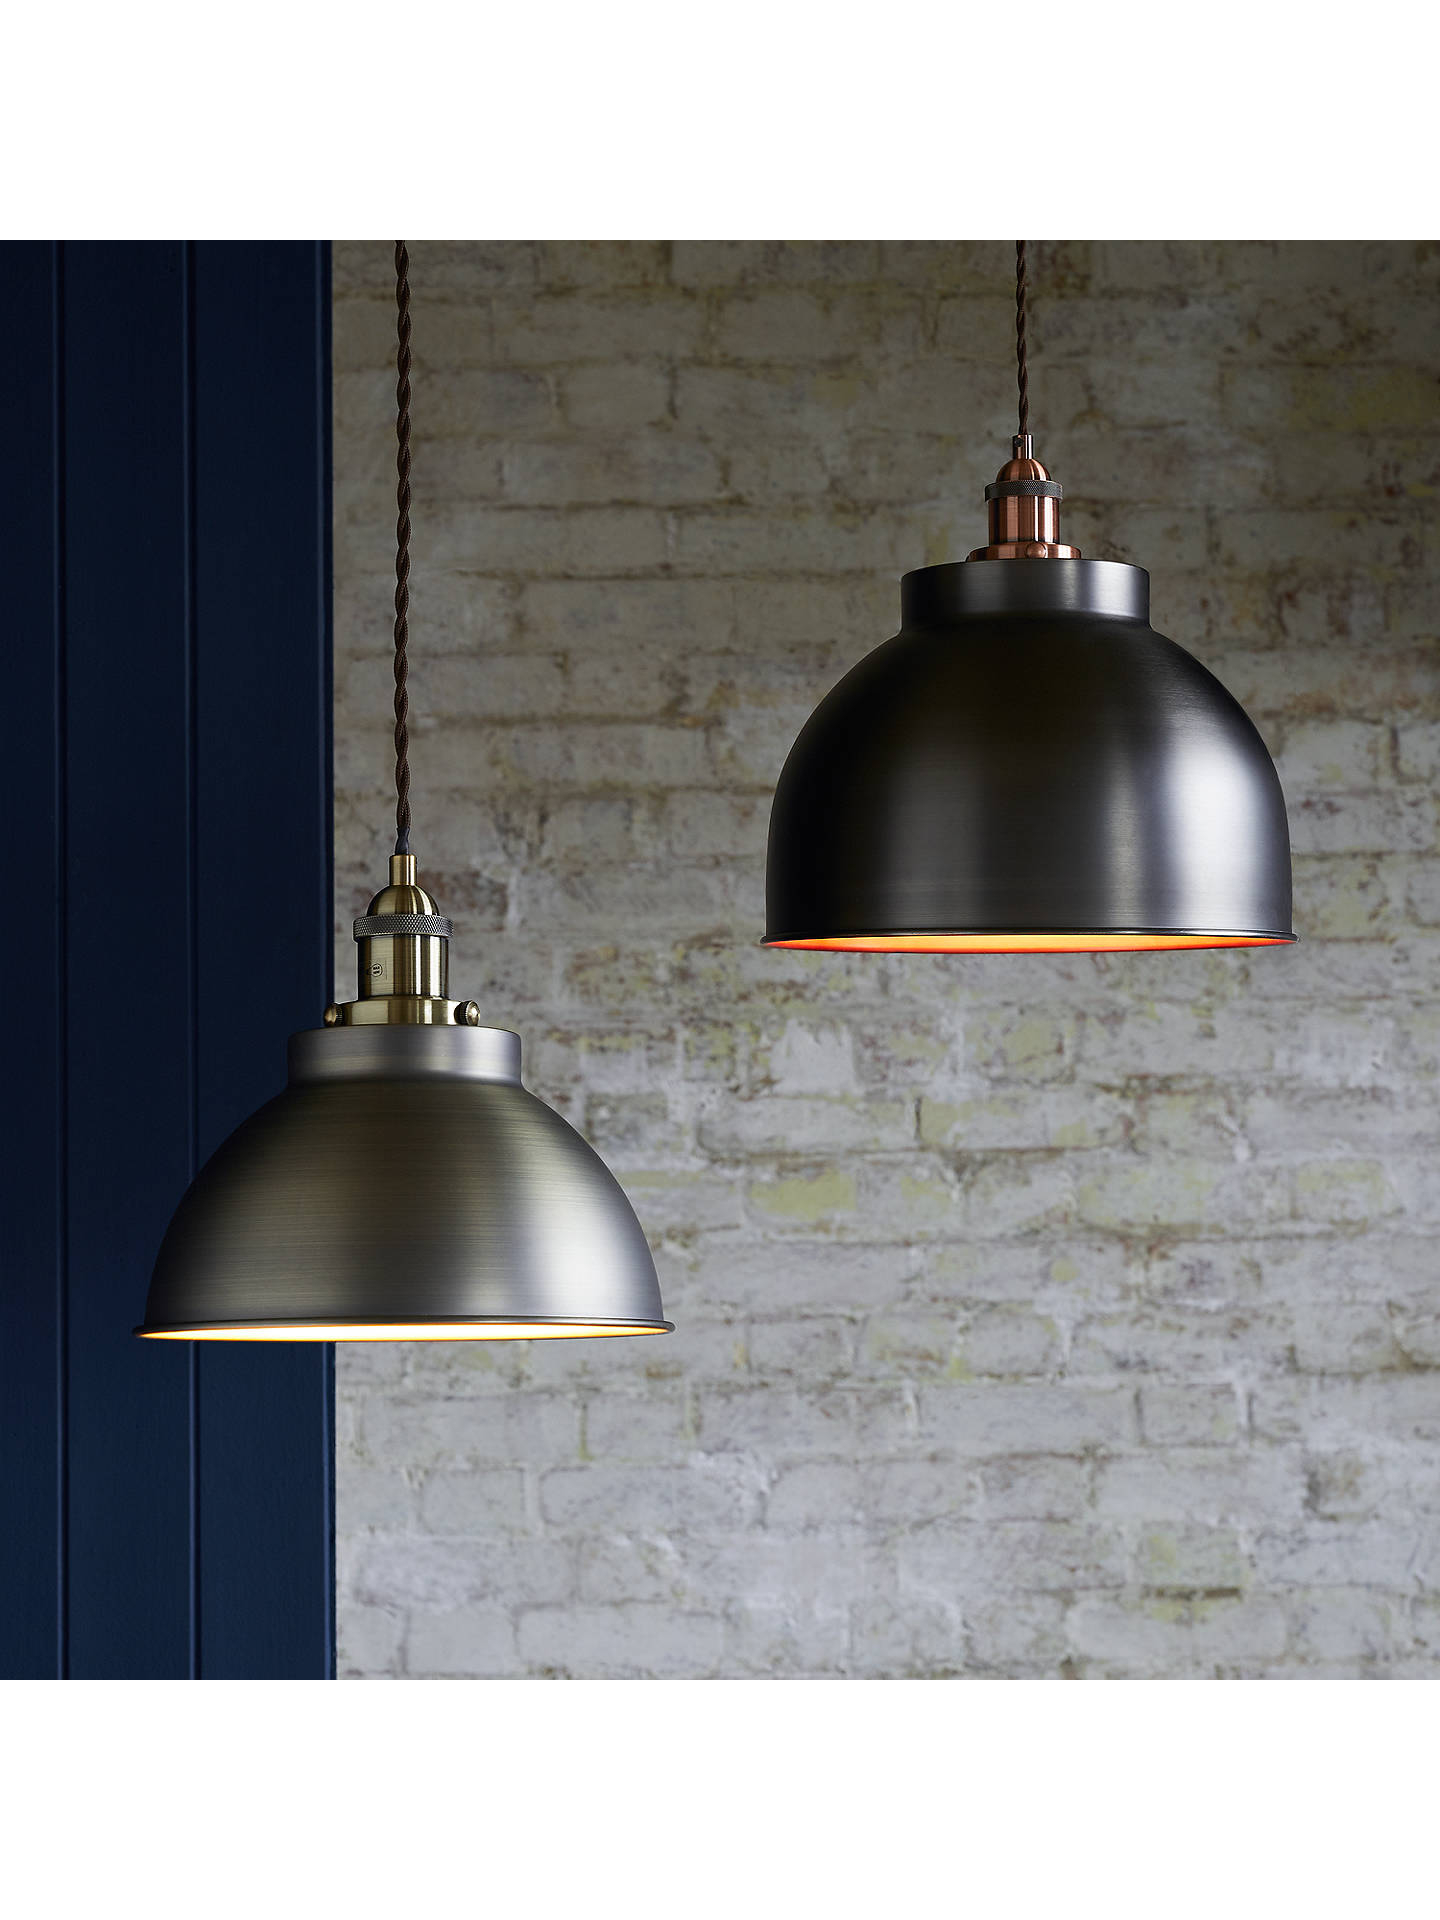 3be3030dce07 Buy John Lewis & Partners Baldwin Pendant Ceiling Light, Antique Brass  Online at johnlewis.